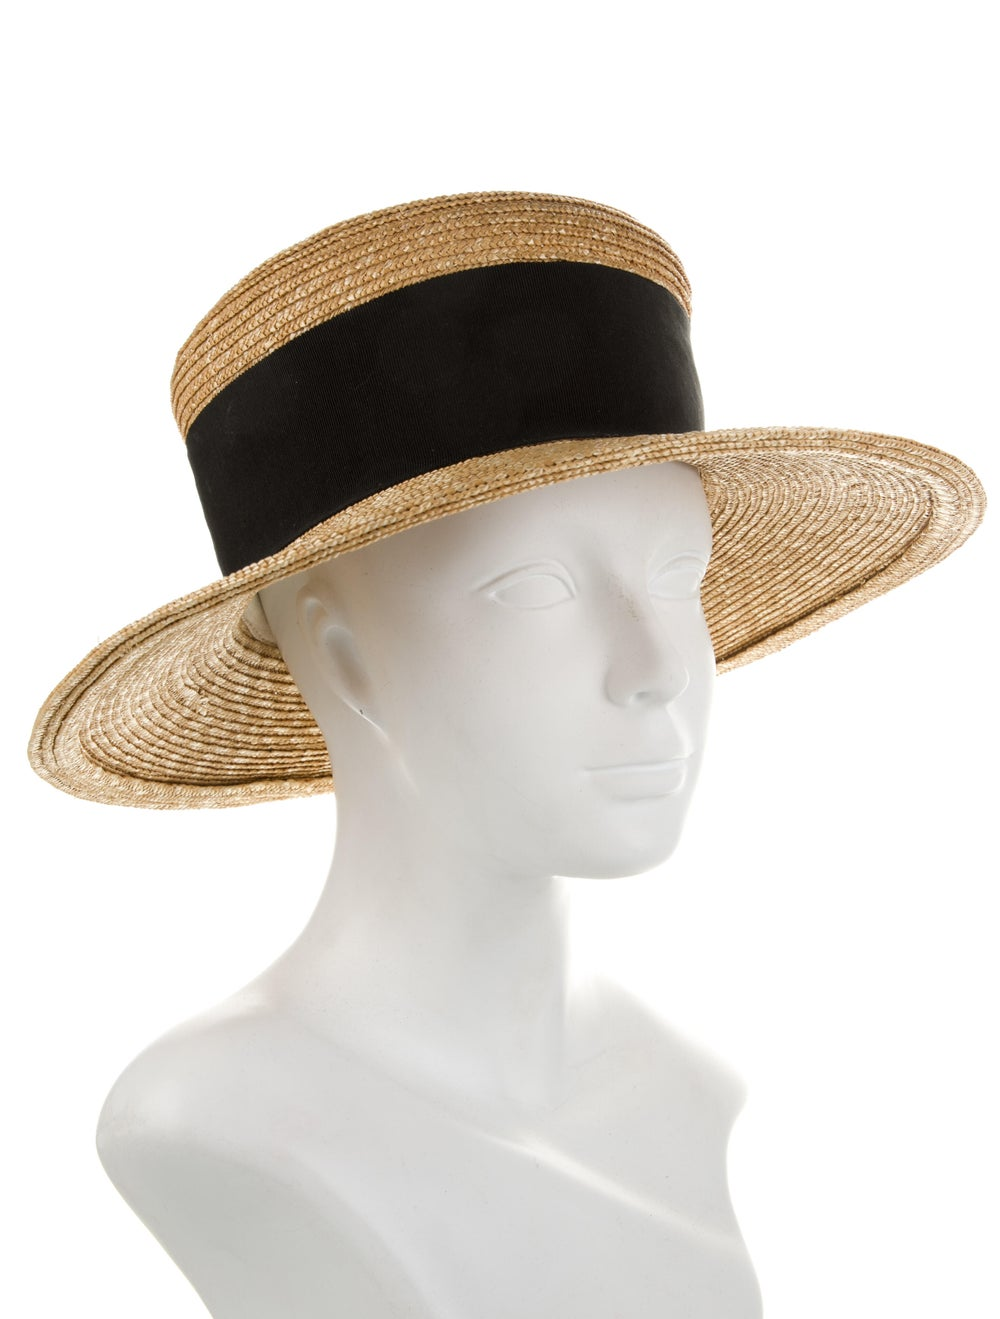 Patricia Underwood Raffia Wide Brim Fedora Hat Tan - image 3